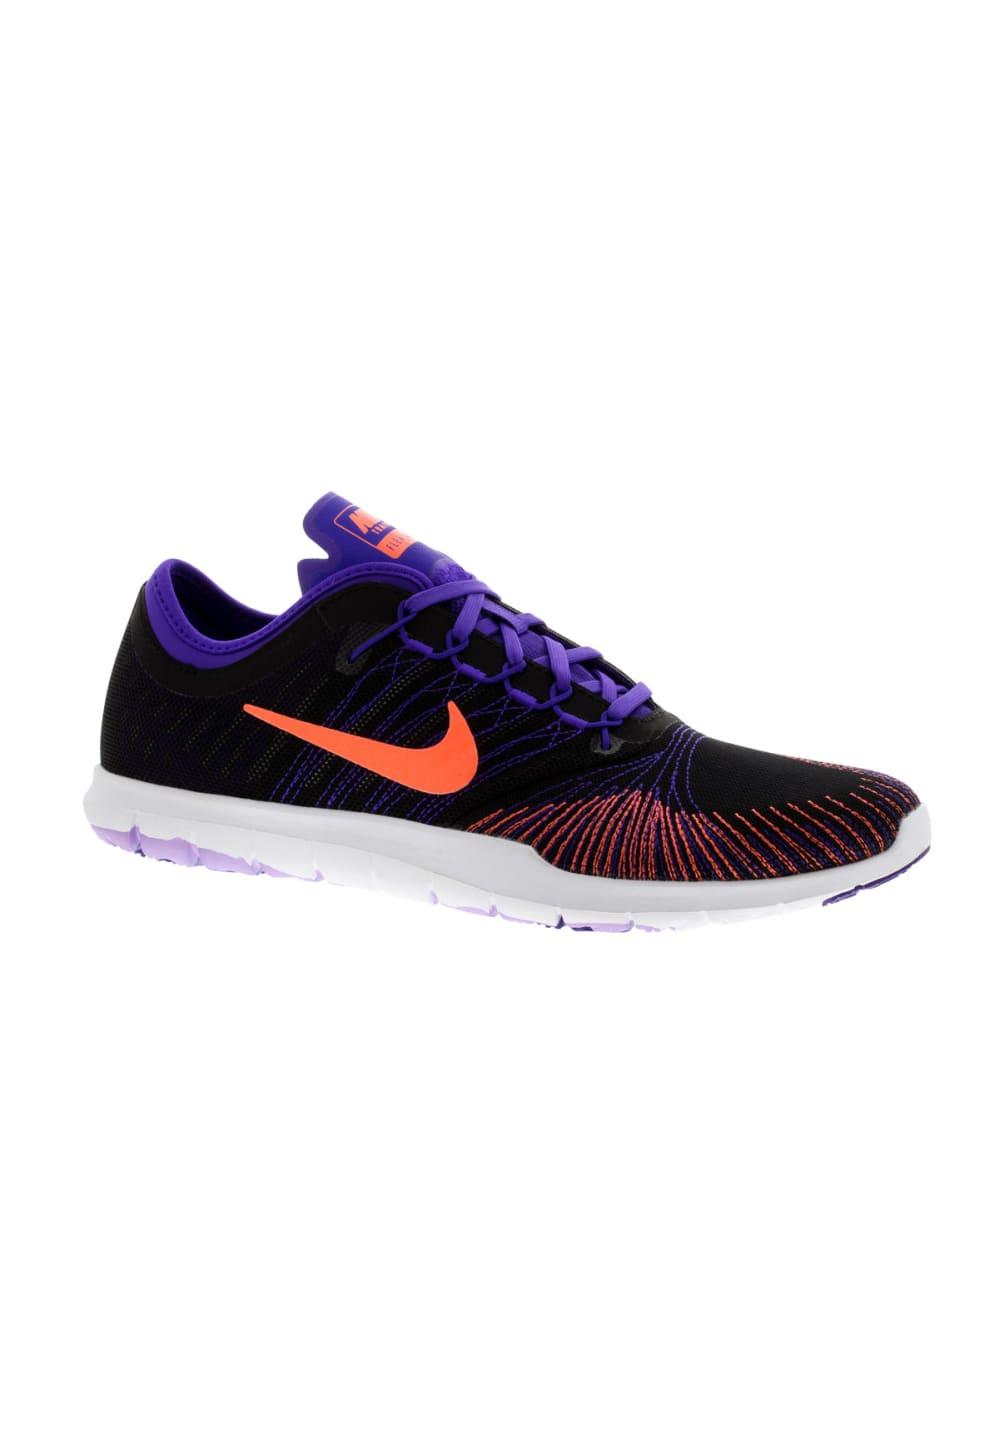 f410ecbc6b7d Nike Flex Adapt Trainer - Fitness shoes for Women - Black